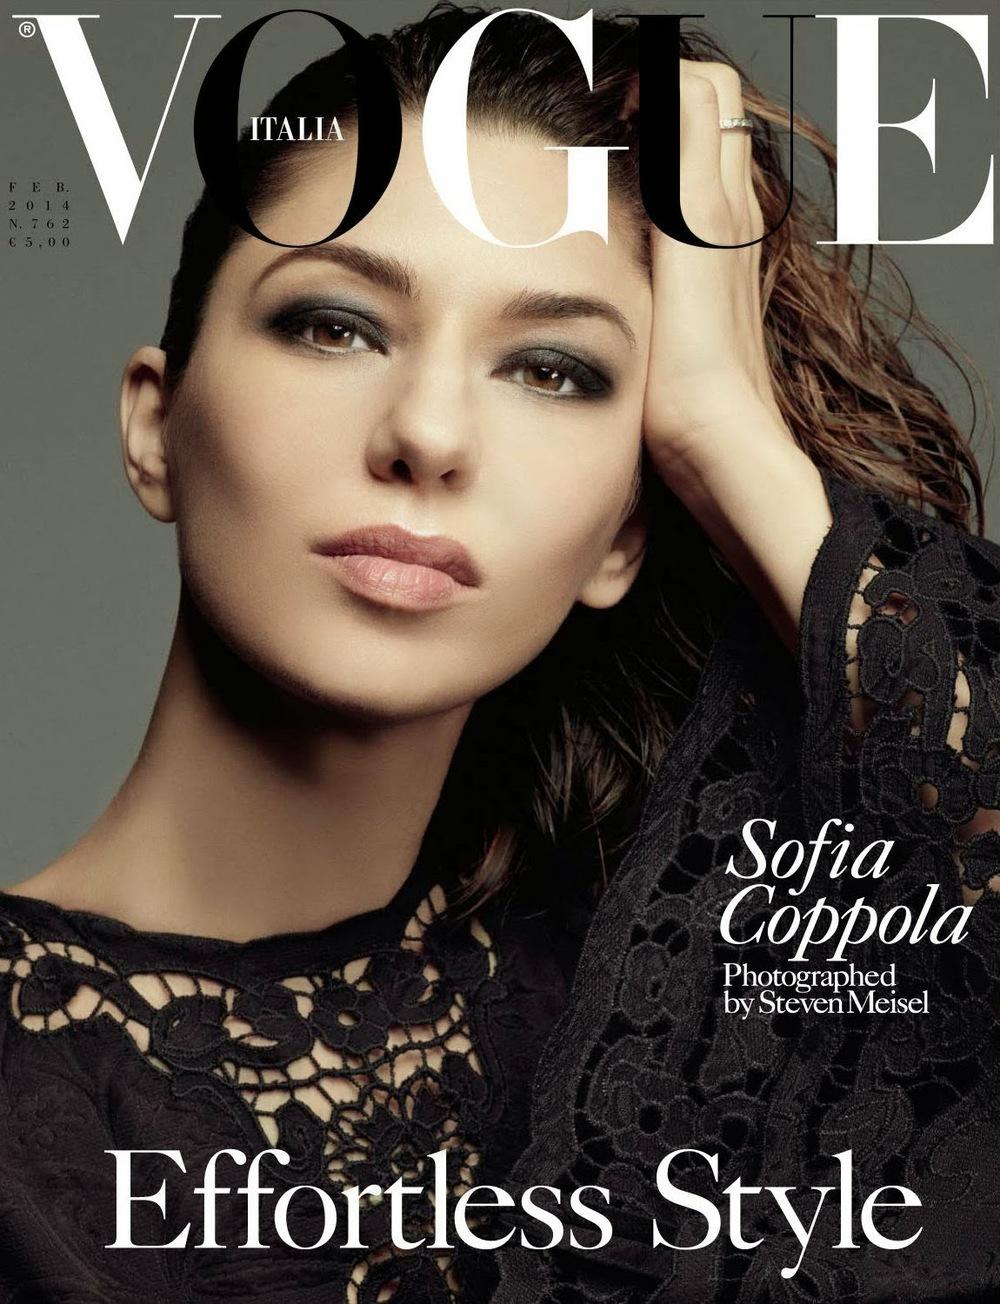 Sofia Coppola by Steven Meisel (Vogue Italia February 2014) 0.jpg